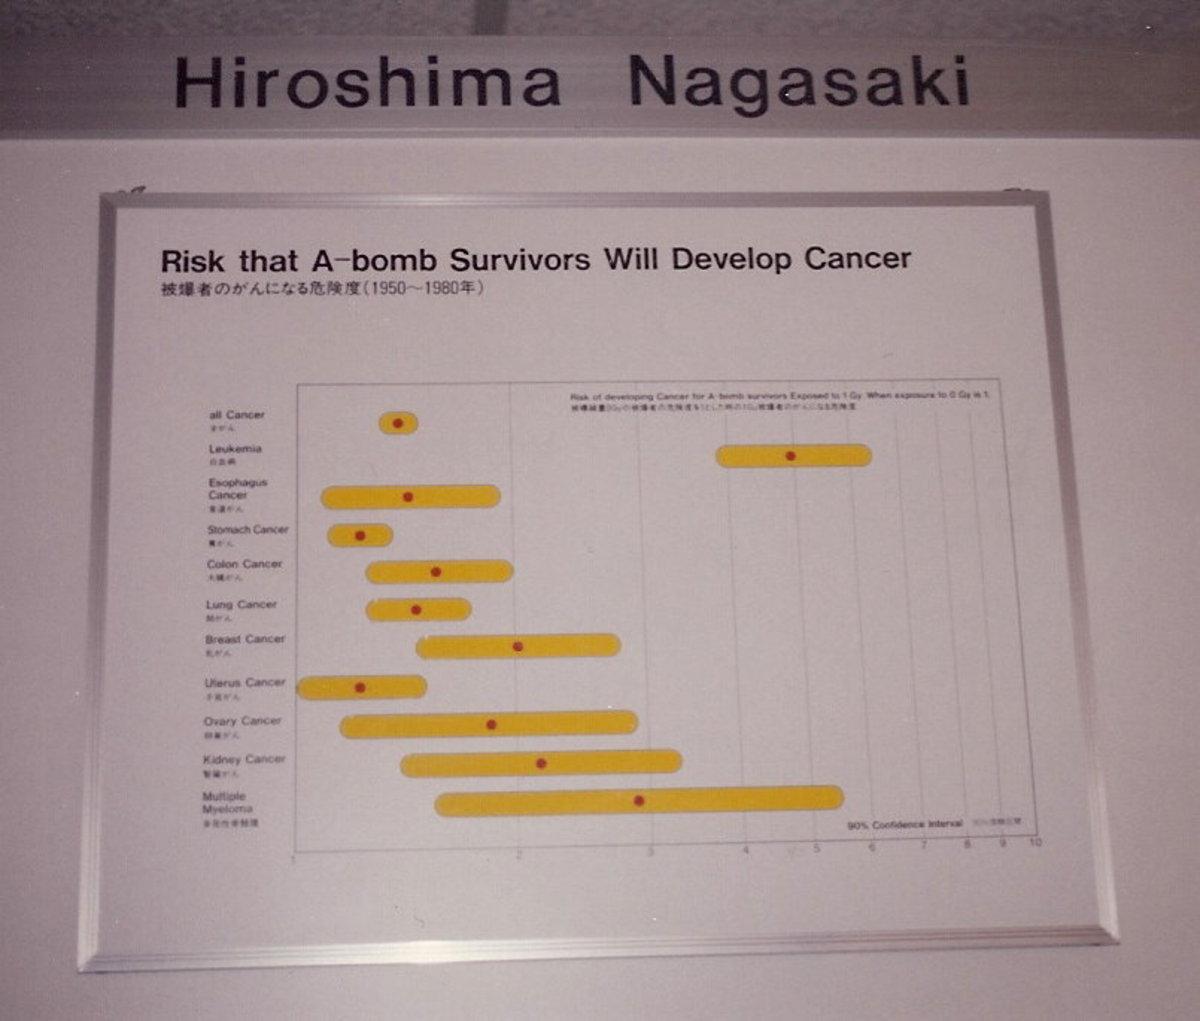 Cancer statistics.